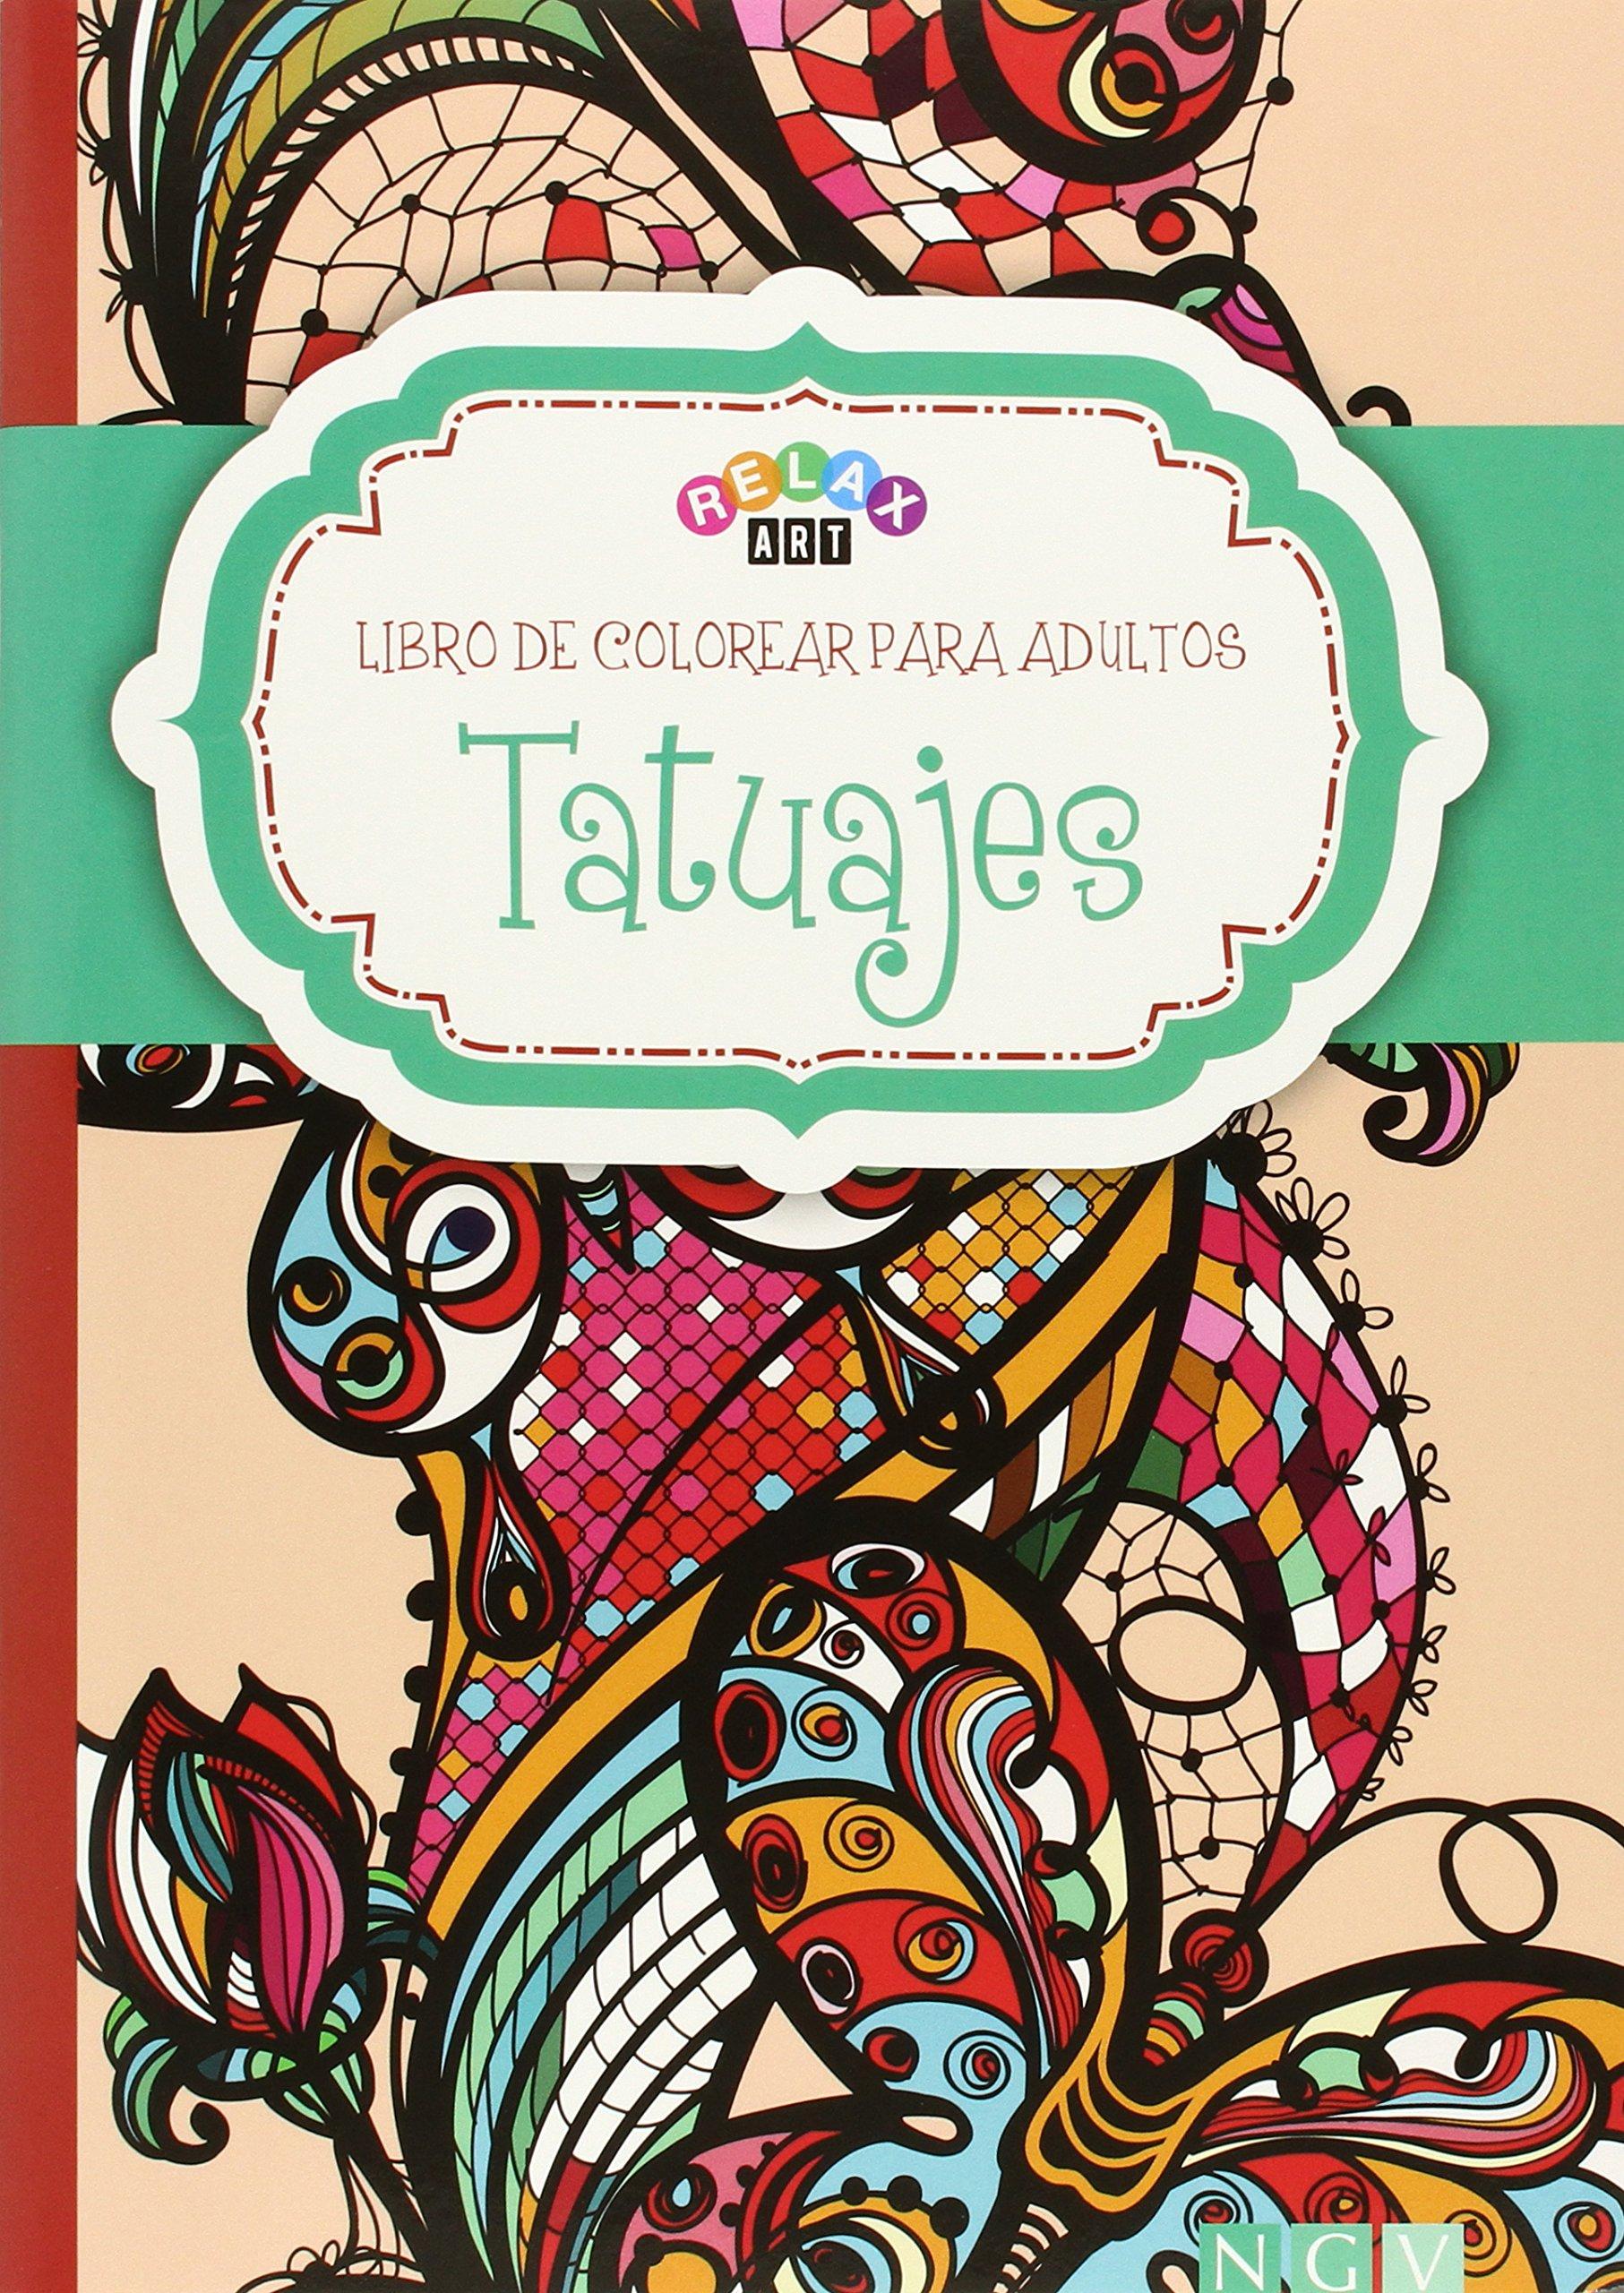 Tatuajes: Libro de colorear para adultos: VV.AA.: 9783869416724